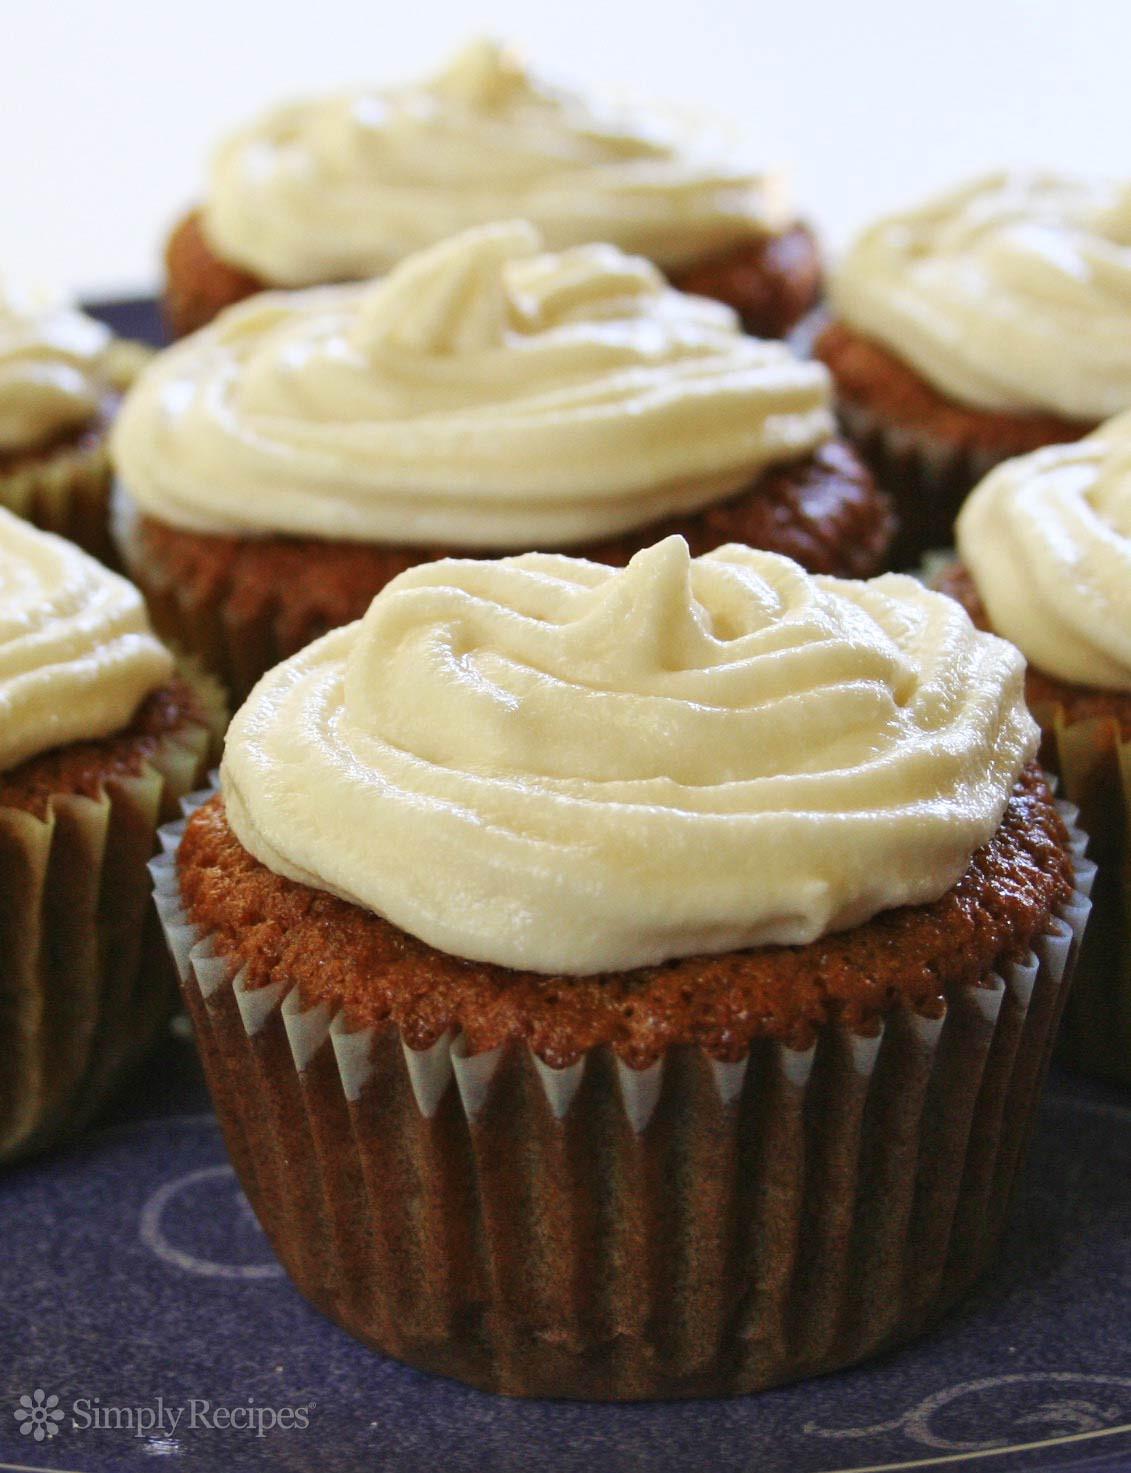 Gluten Free Cupcakes Recipe  Gluten free Pumpkin Cupcakes Recipe